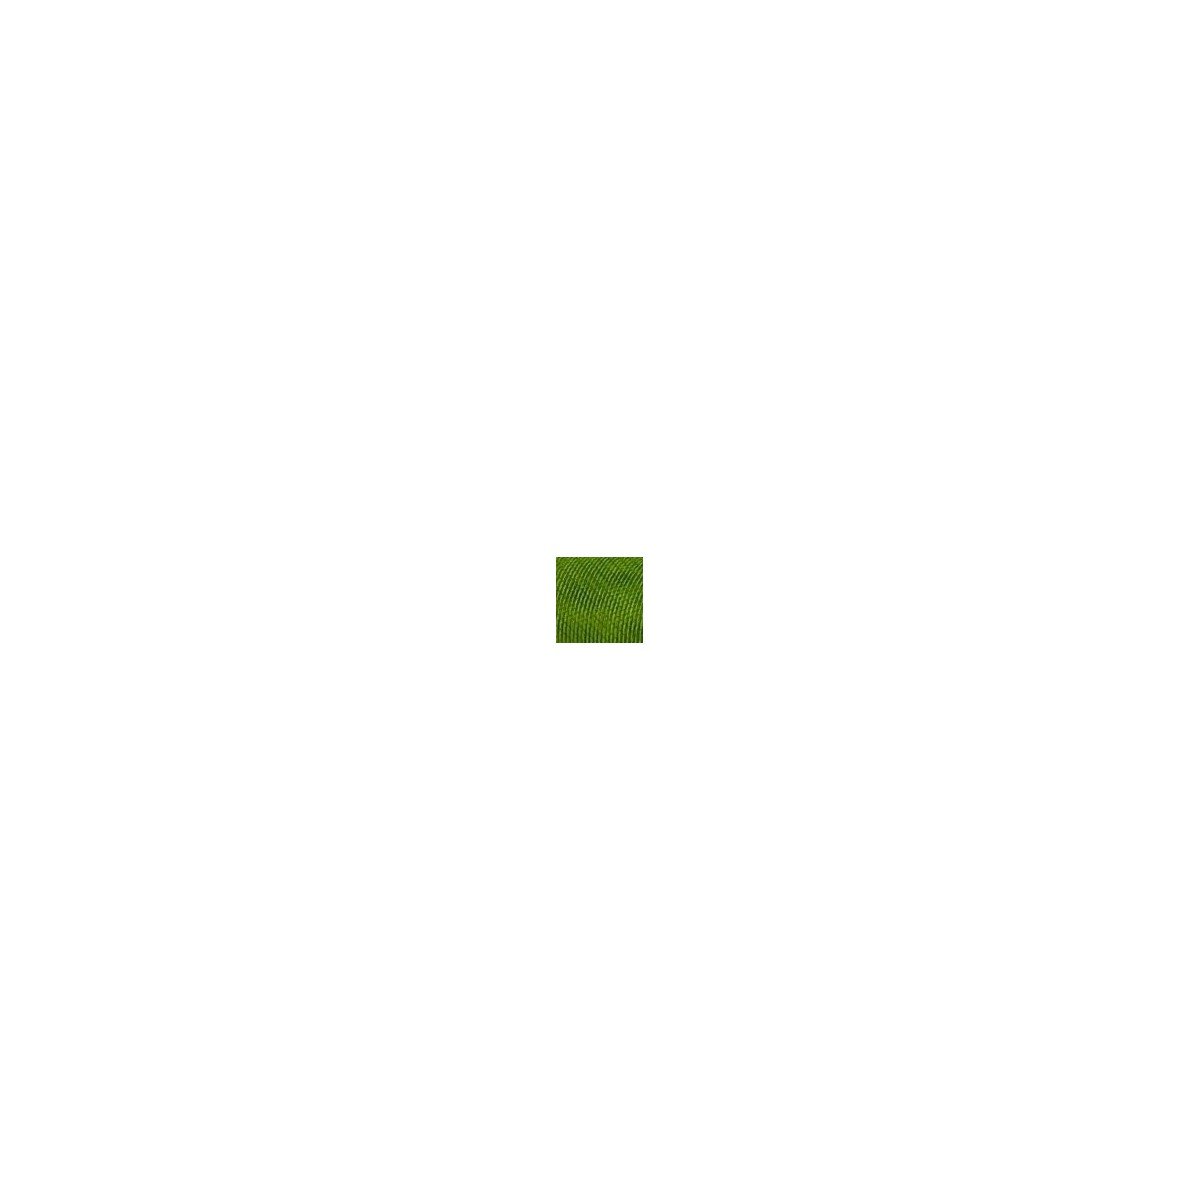 Deconet Telo Retina Cm.54x9,2 Mt. Verde Muschio